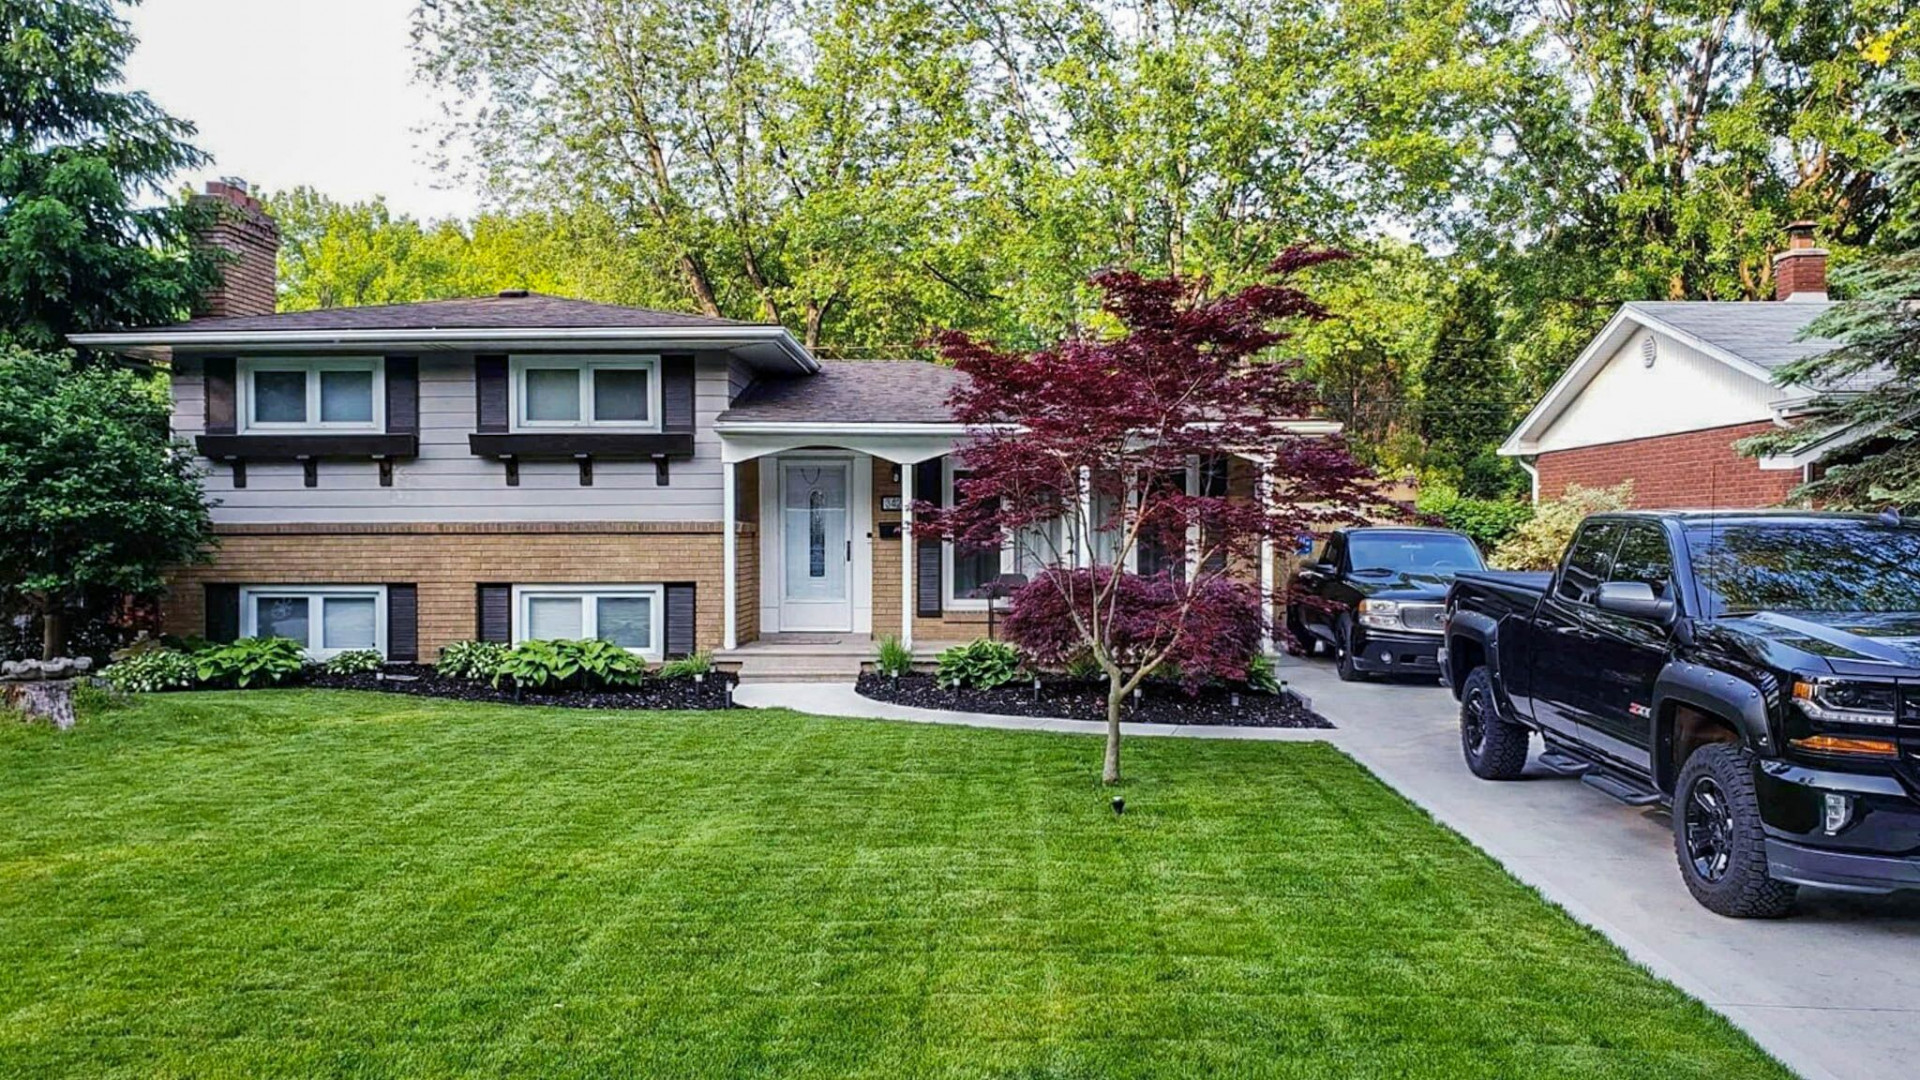 3420 Askin South Windsor Property for Sale